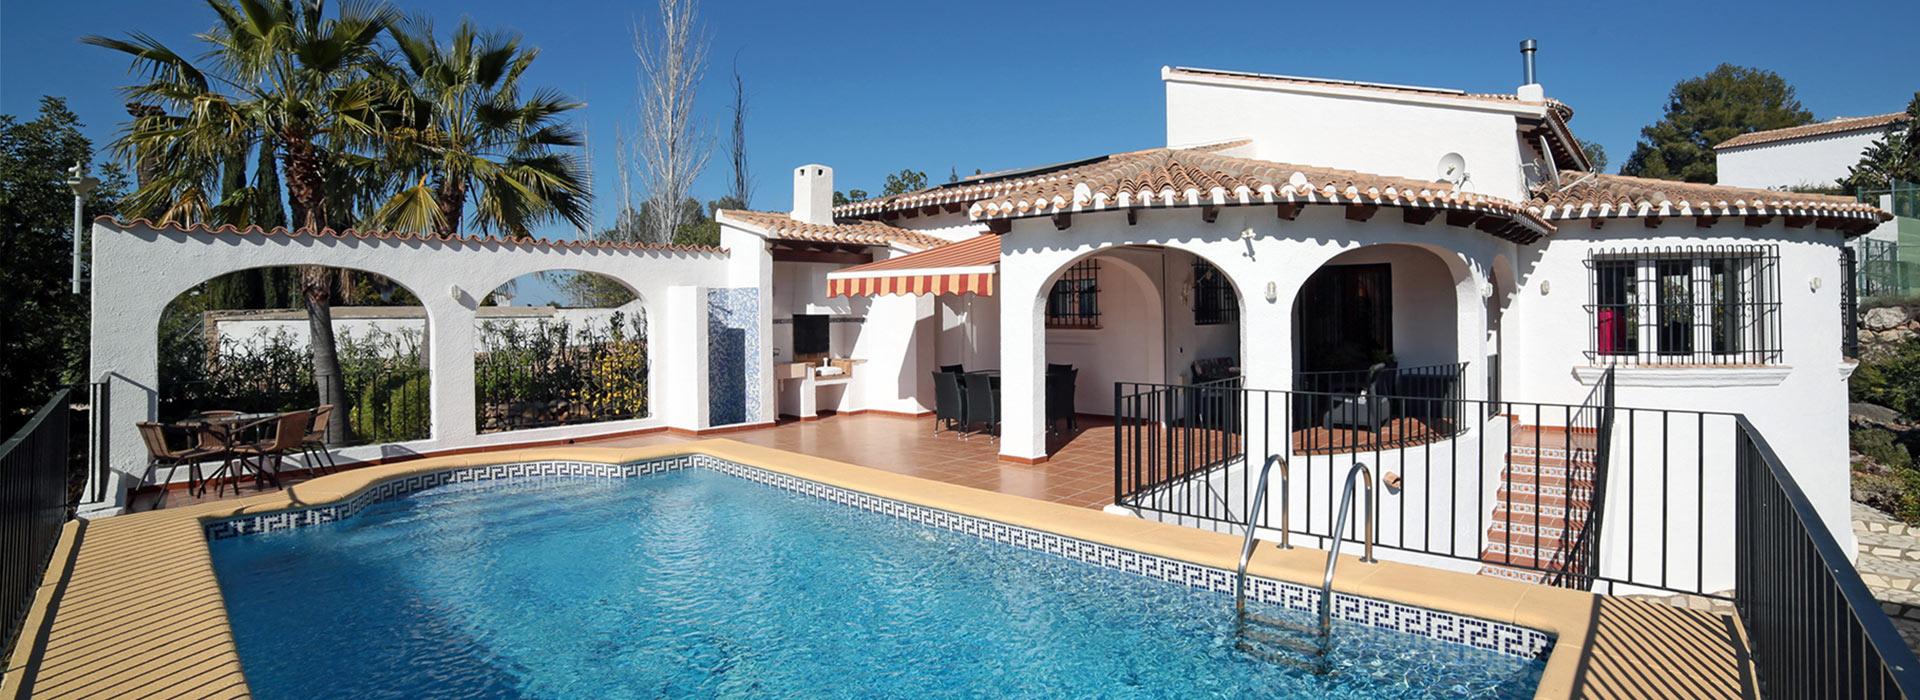 acb.immo - Grande villa de plain-pied avec 4 chambres à Monte Pego, Denia